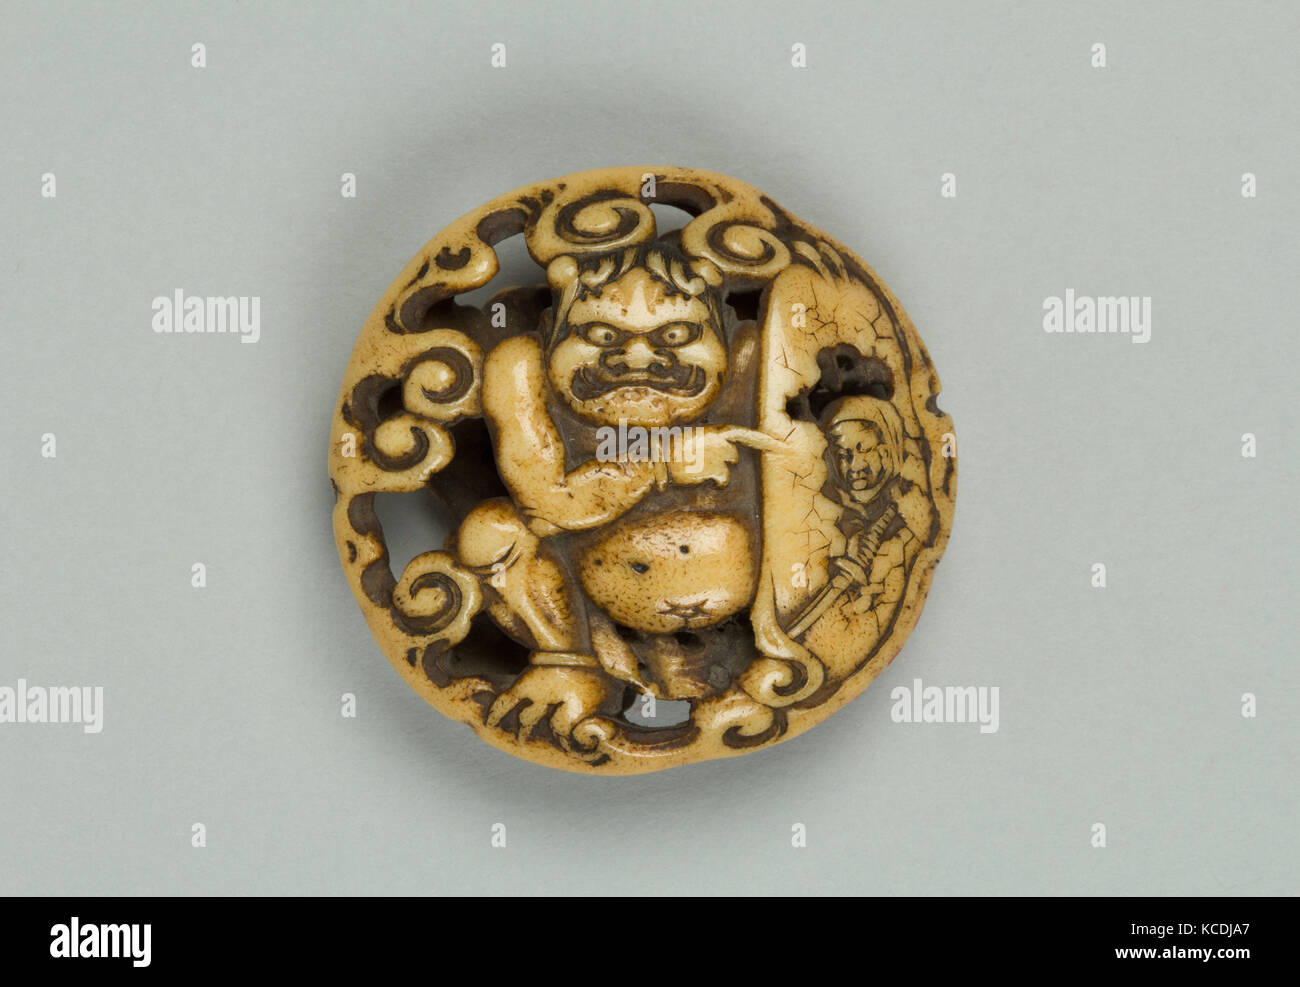 Netsuke With Carved Demon 18th Century Japan Bone H 1 2 In 1 3 Stock Photo Alamy